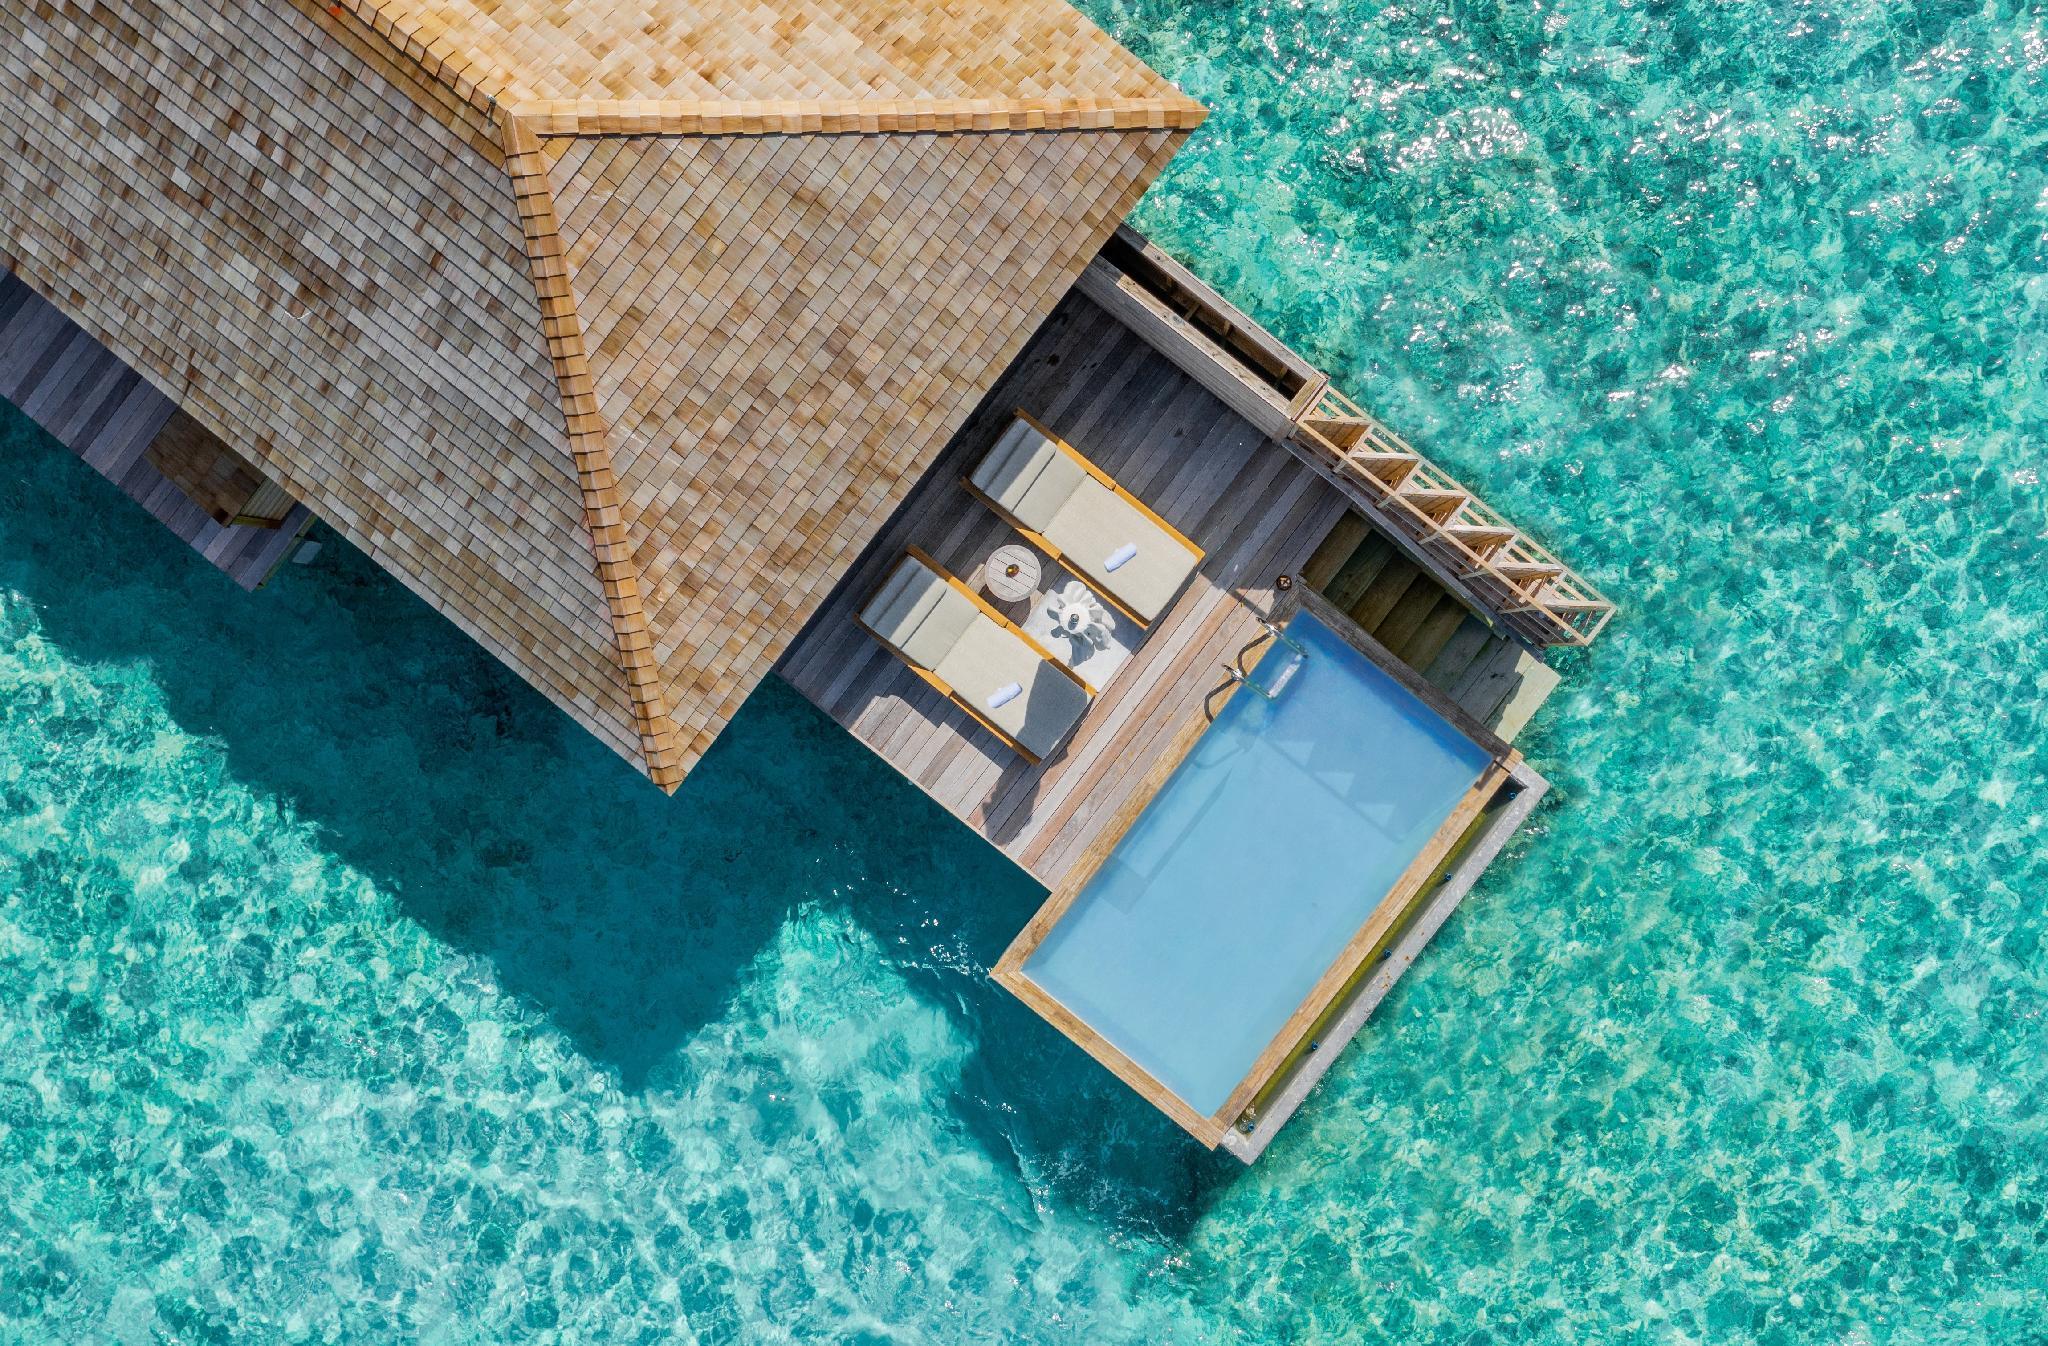 Kagi Maldives Spa Island جزر المالديف احصل على لائحة أسعار 2021 ومع إلغاء مجاني